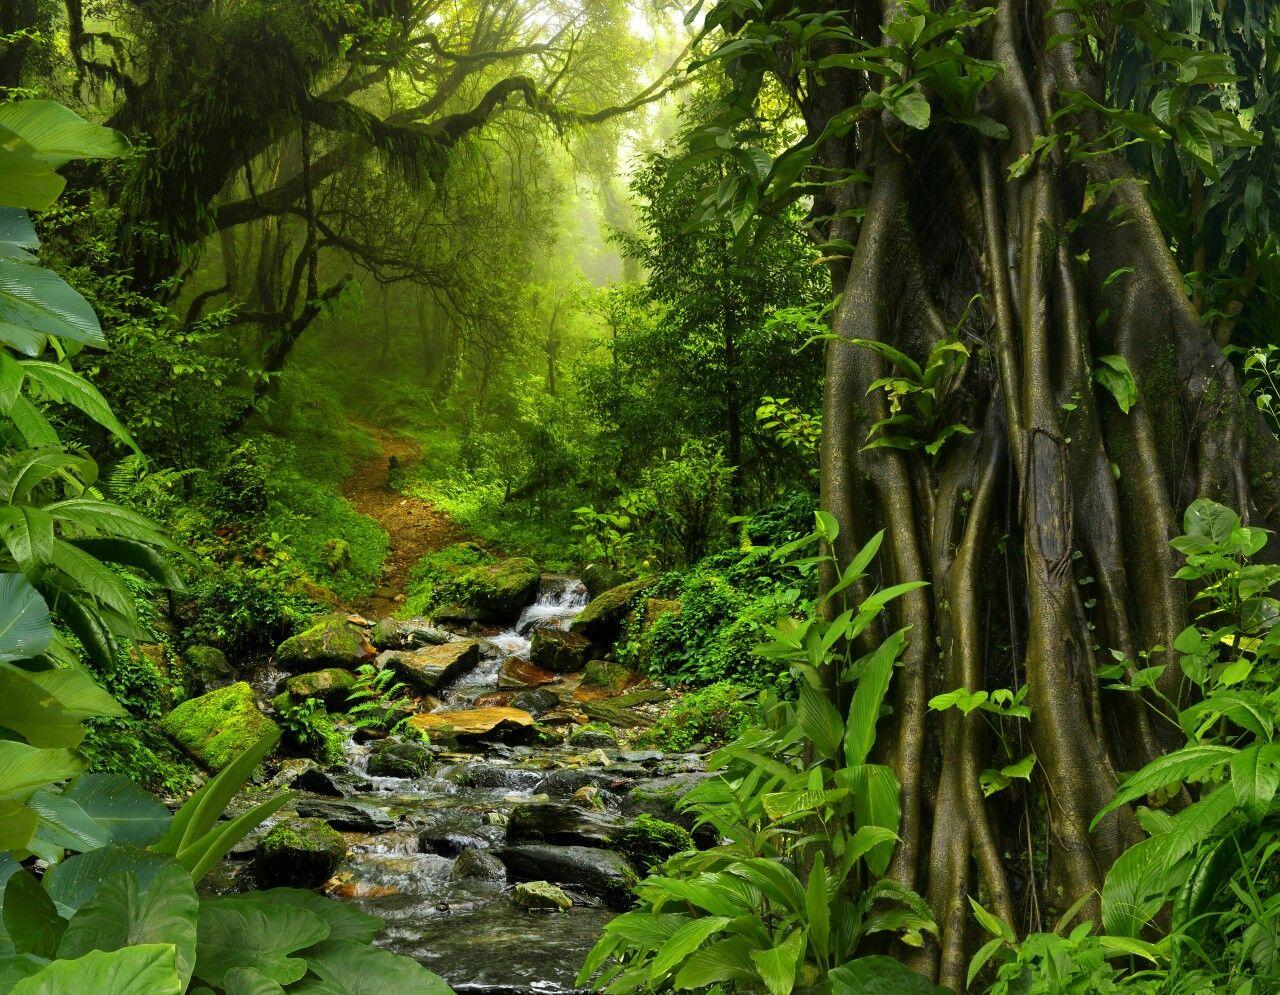 Pin by Vishnukaurora on nature Rainforest, Jungle wall